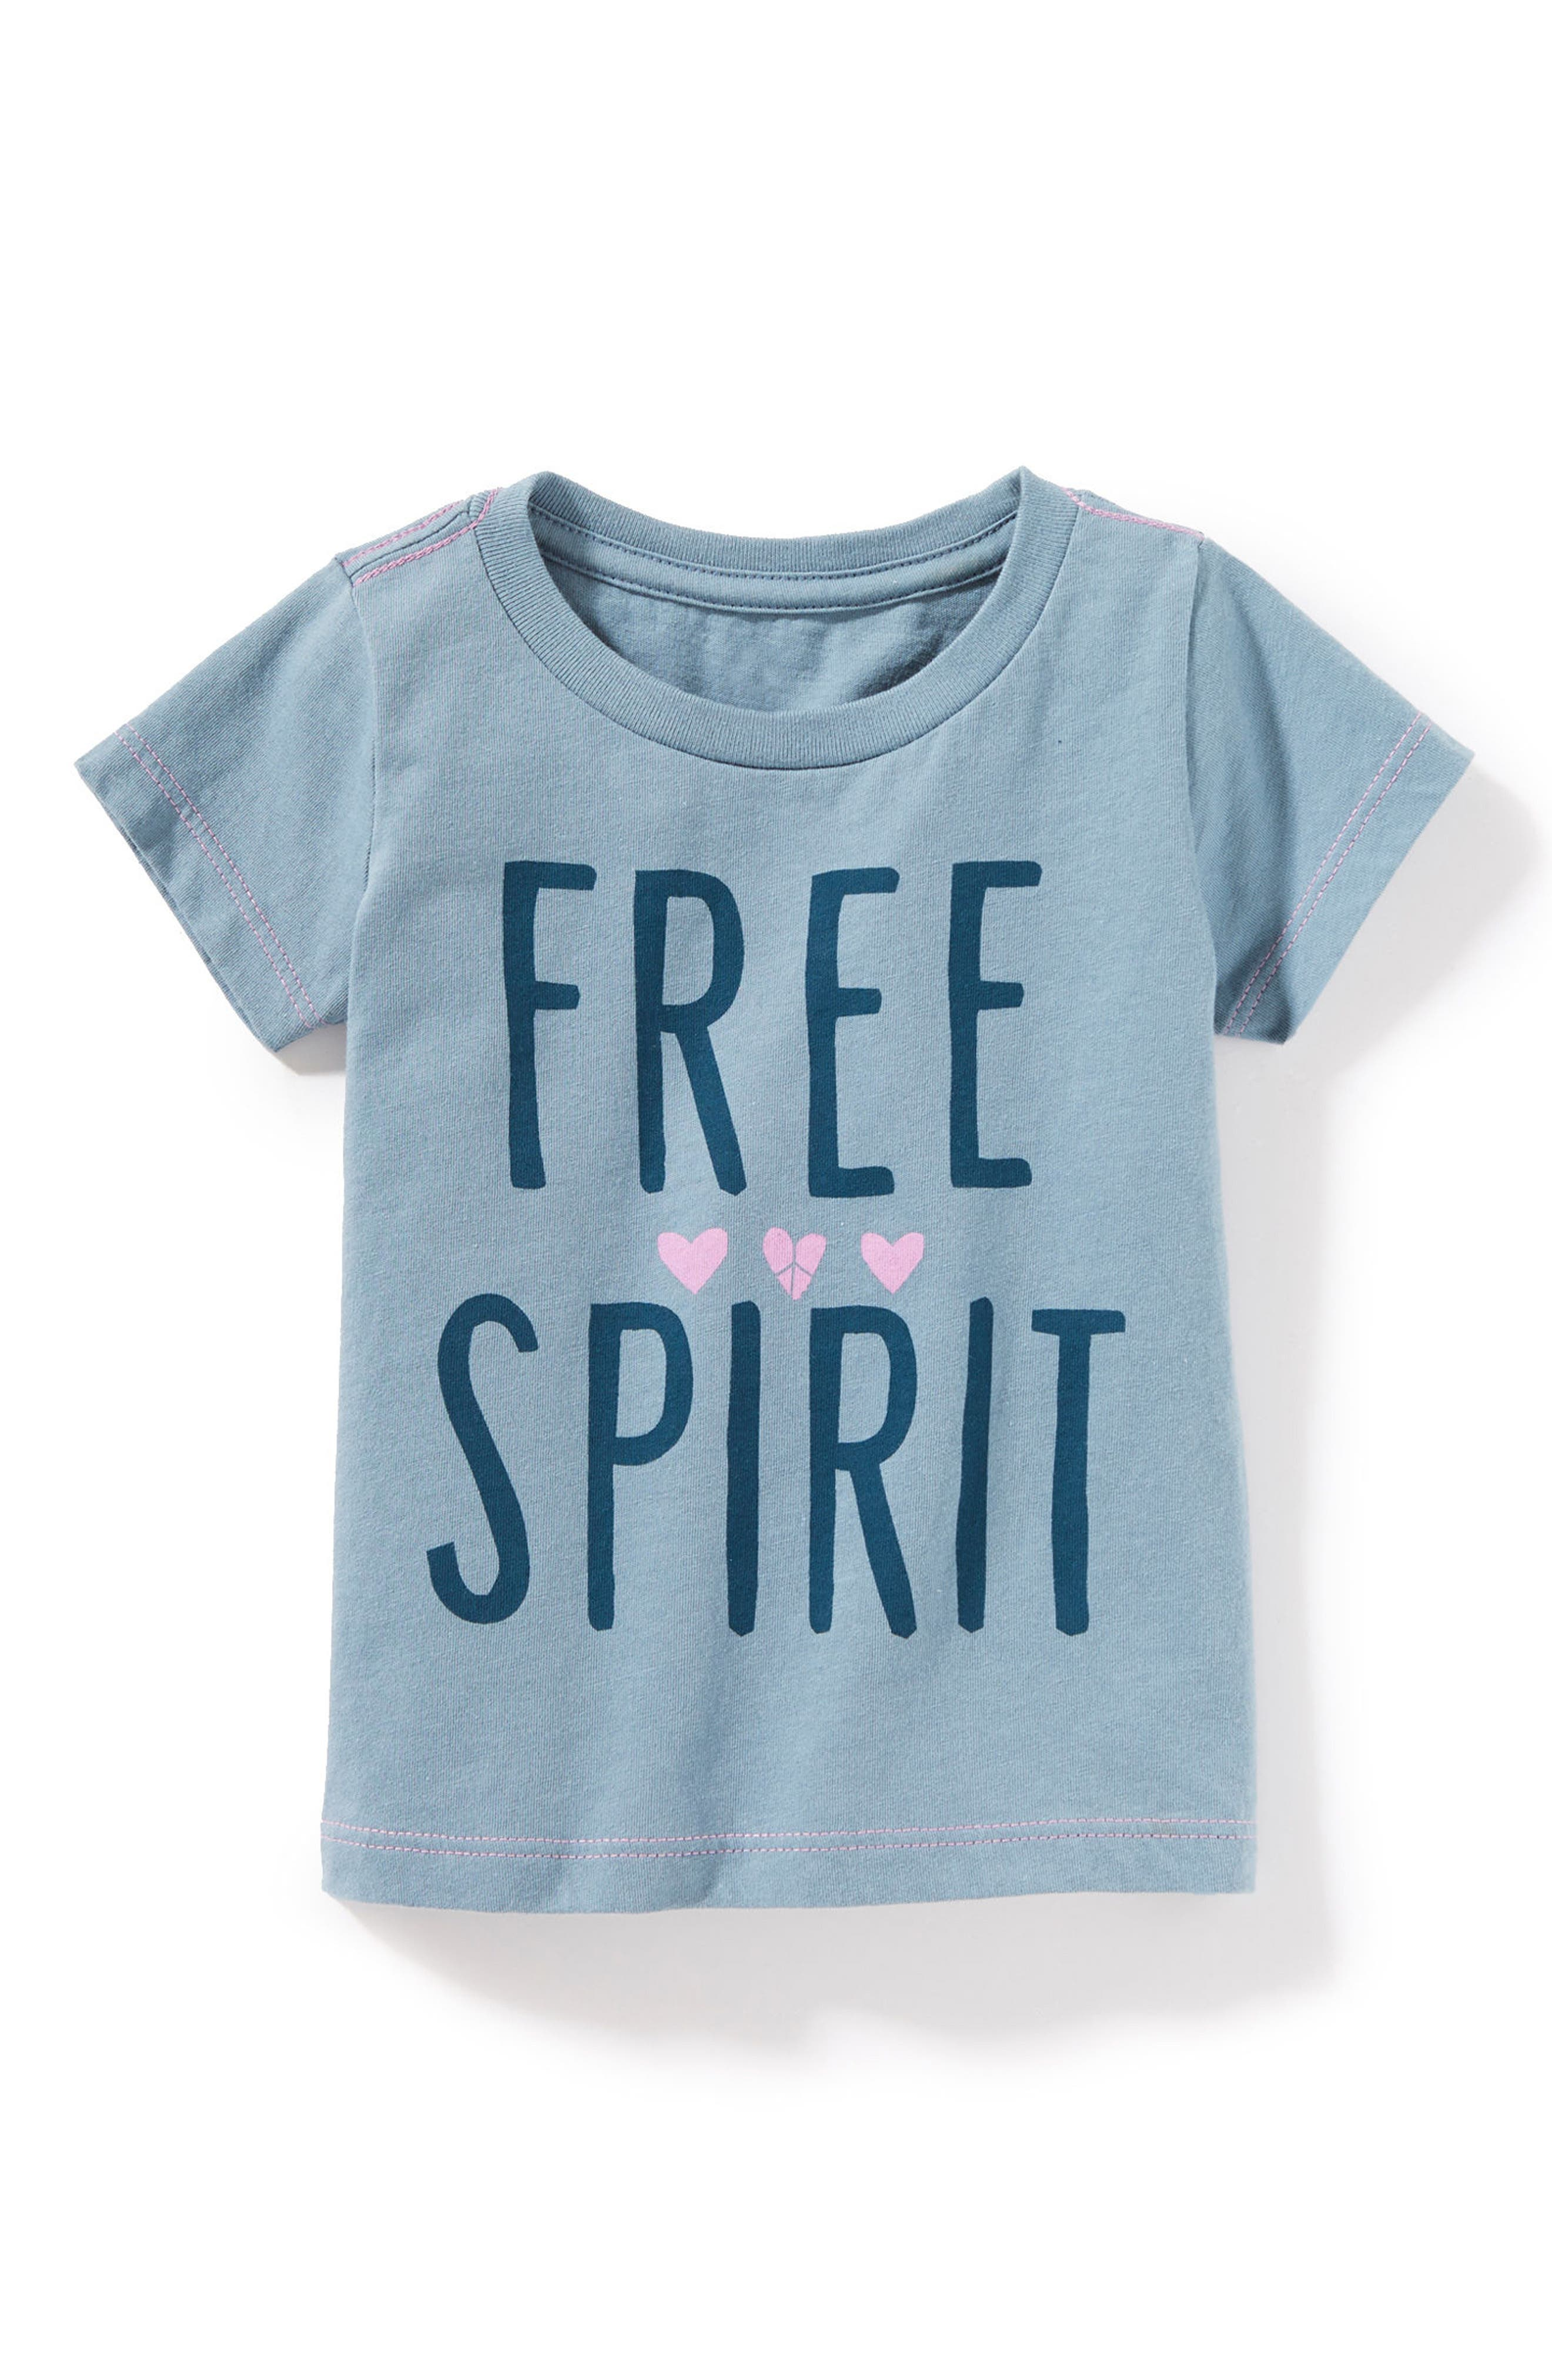 Main Image - Peek Free Spirit Graphic Tee (Baby Girls)